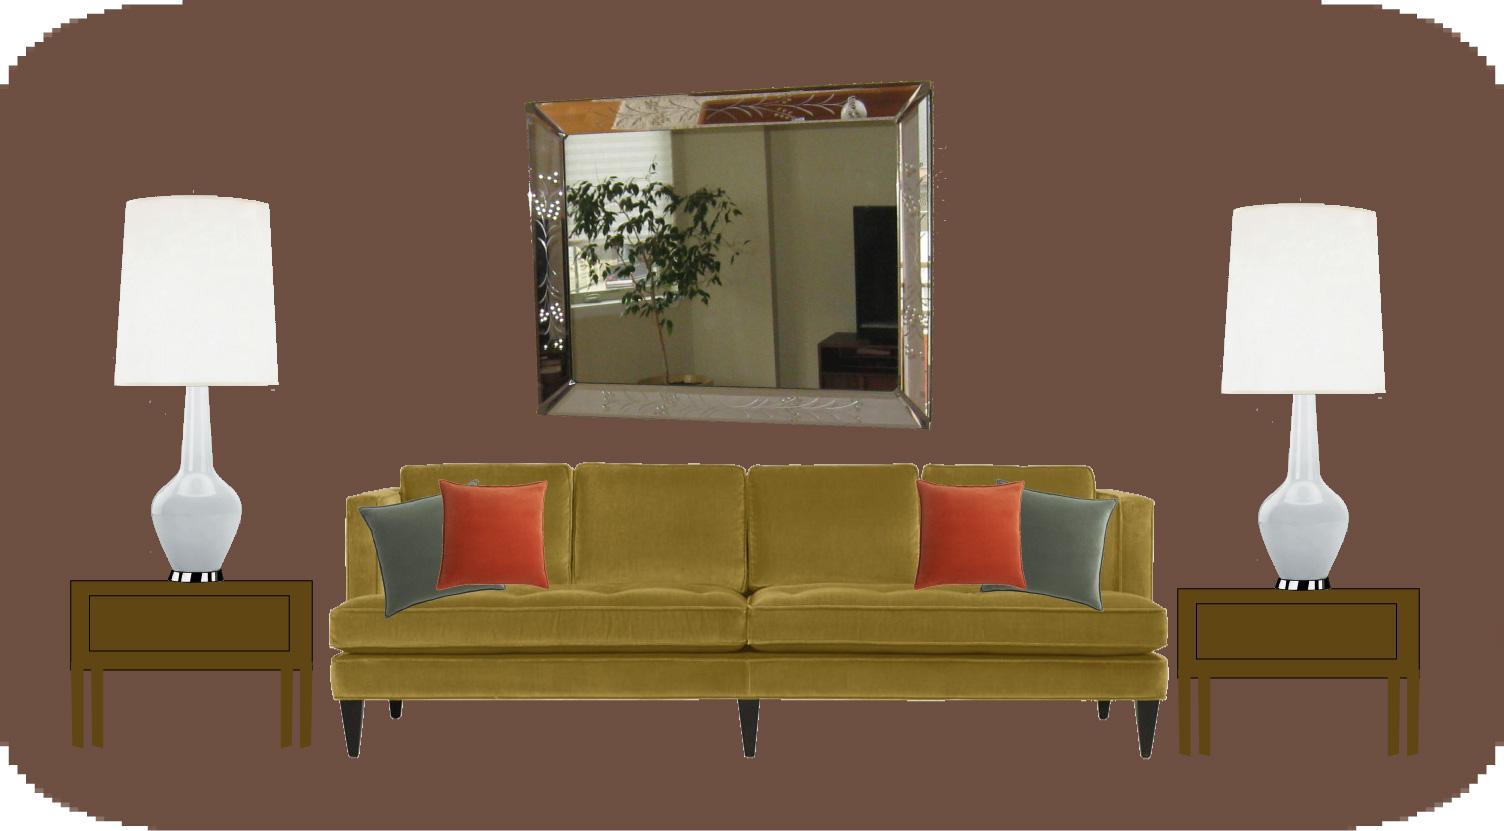 http://4.bp.blogspot.com/_GDh2CsL0Qok/TKvtfWogSlI/AAAAAAAAEEo/9pDT-Z6EV4M/s1600/living_room_mock-up.jpg